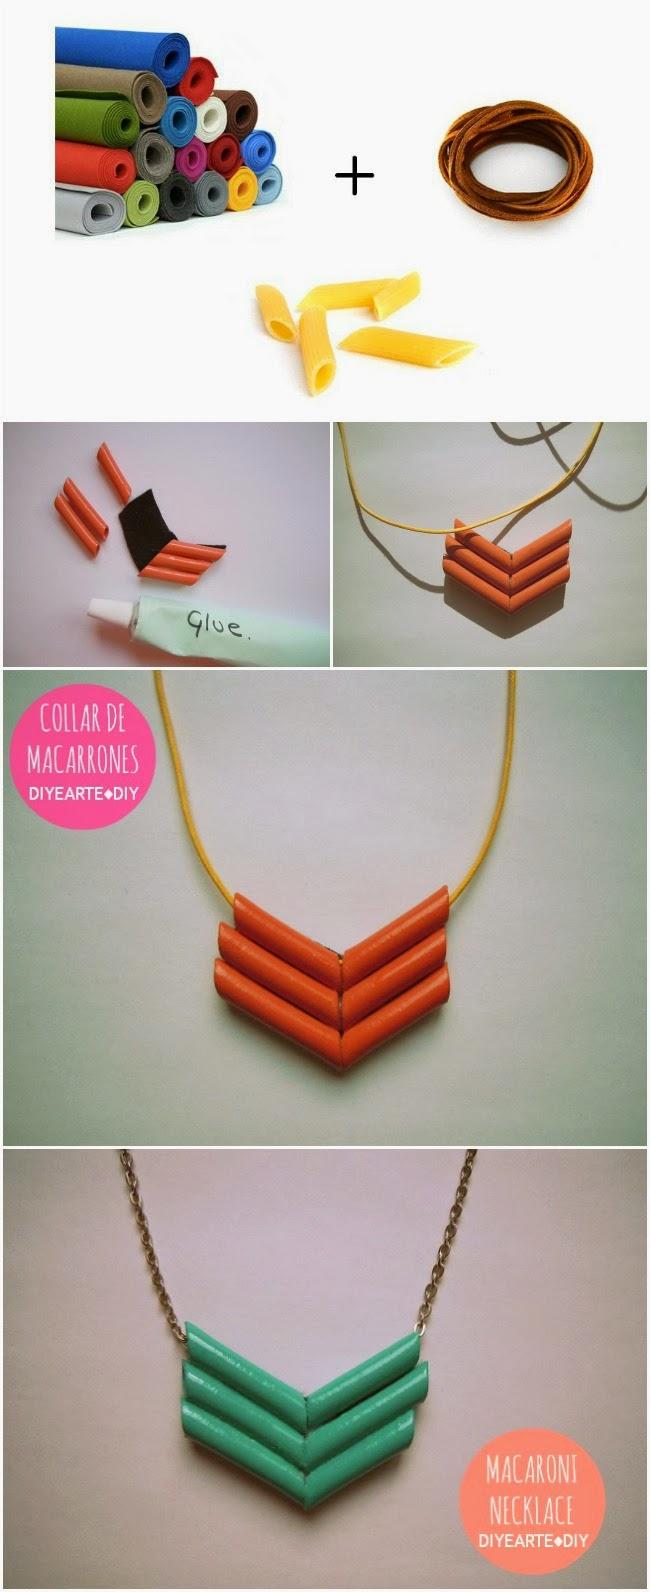 macaroni-necklace-collar-macarrones-child-children-diy-diyearte-homemade-handmade-jewelry